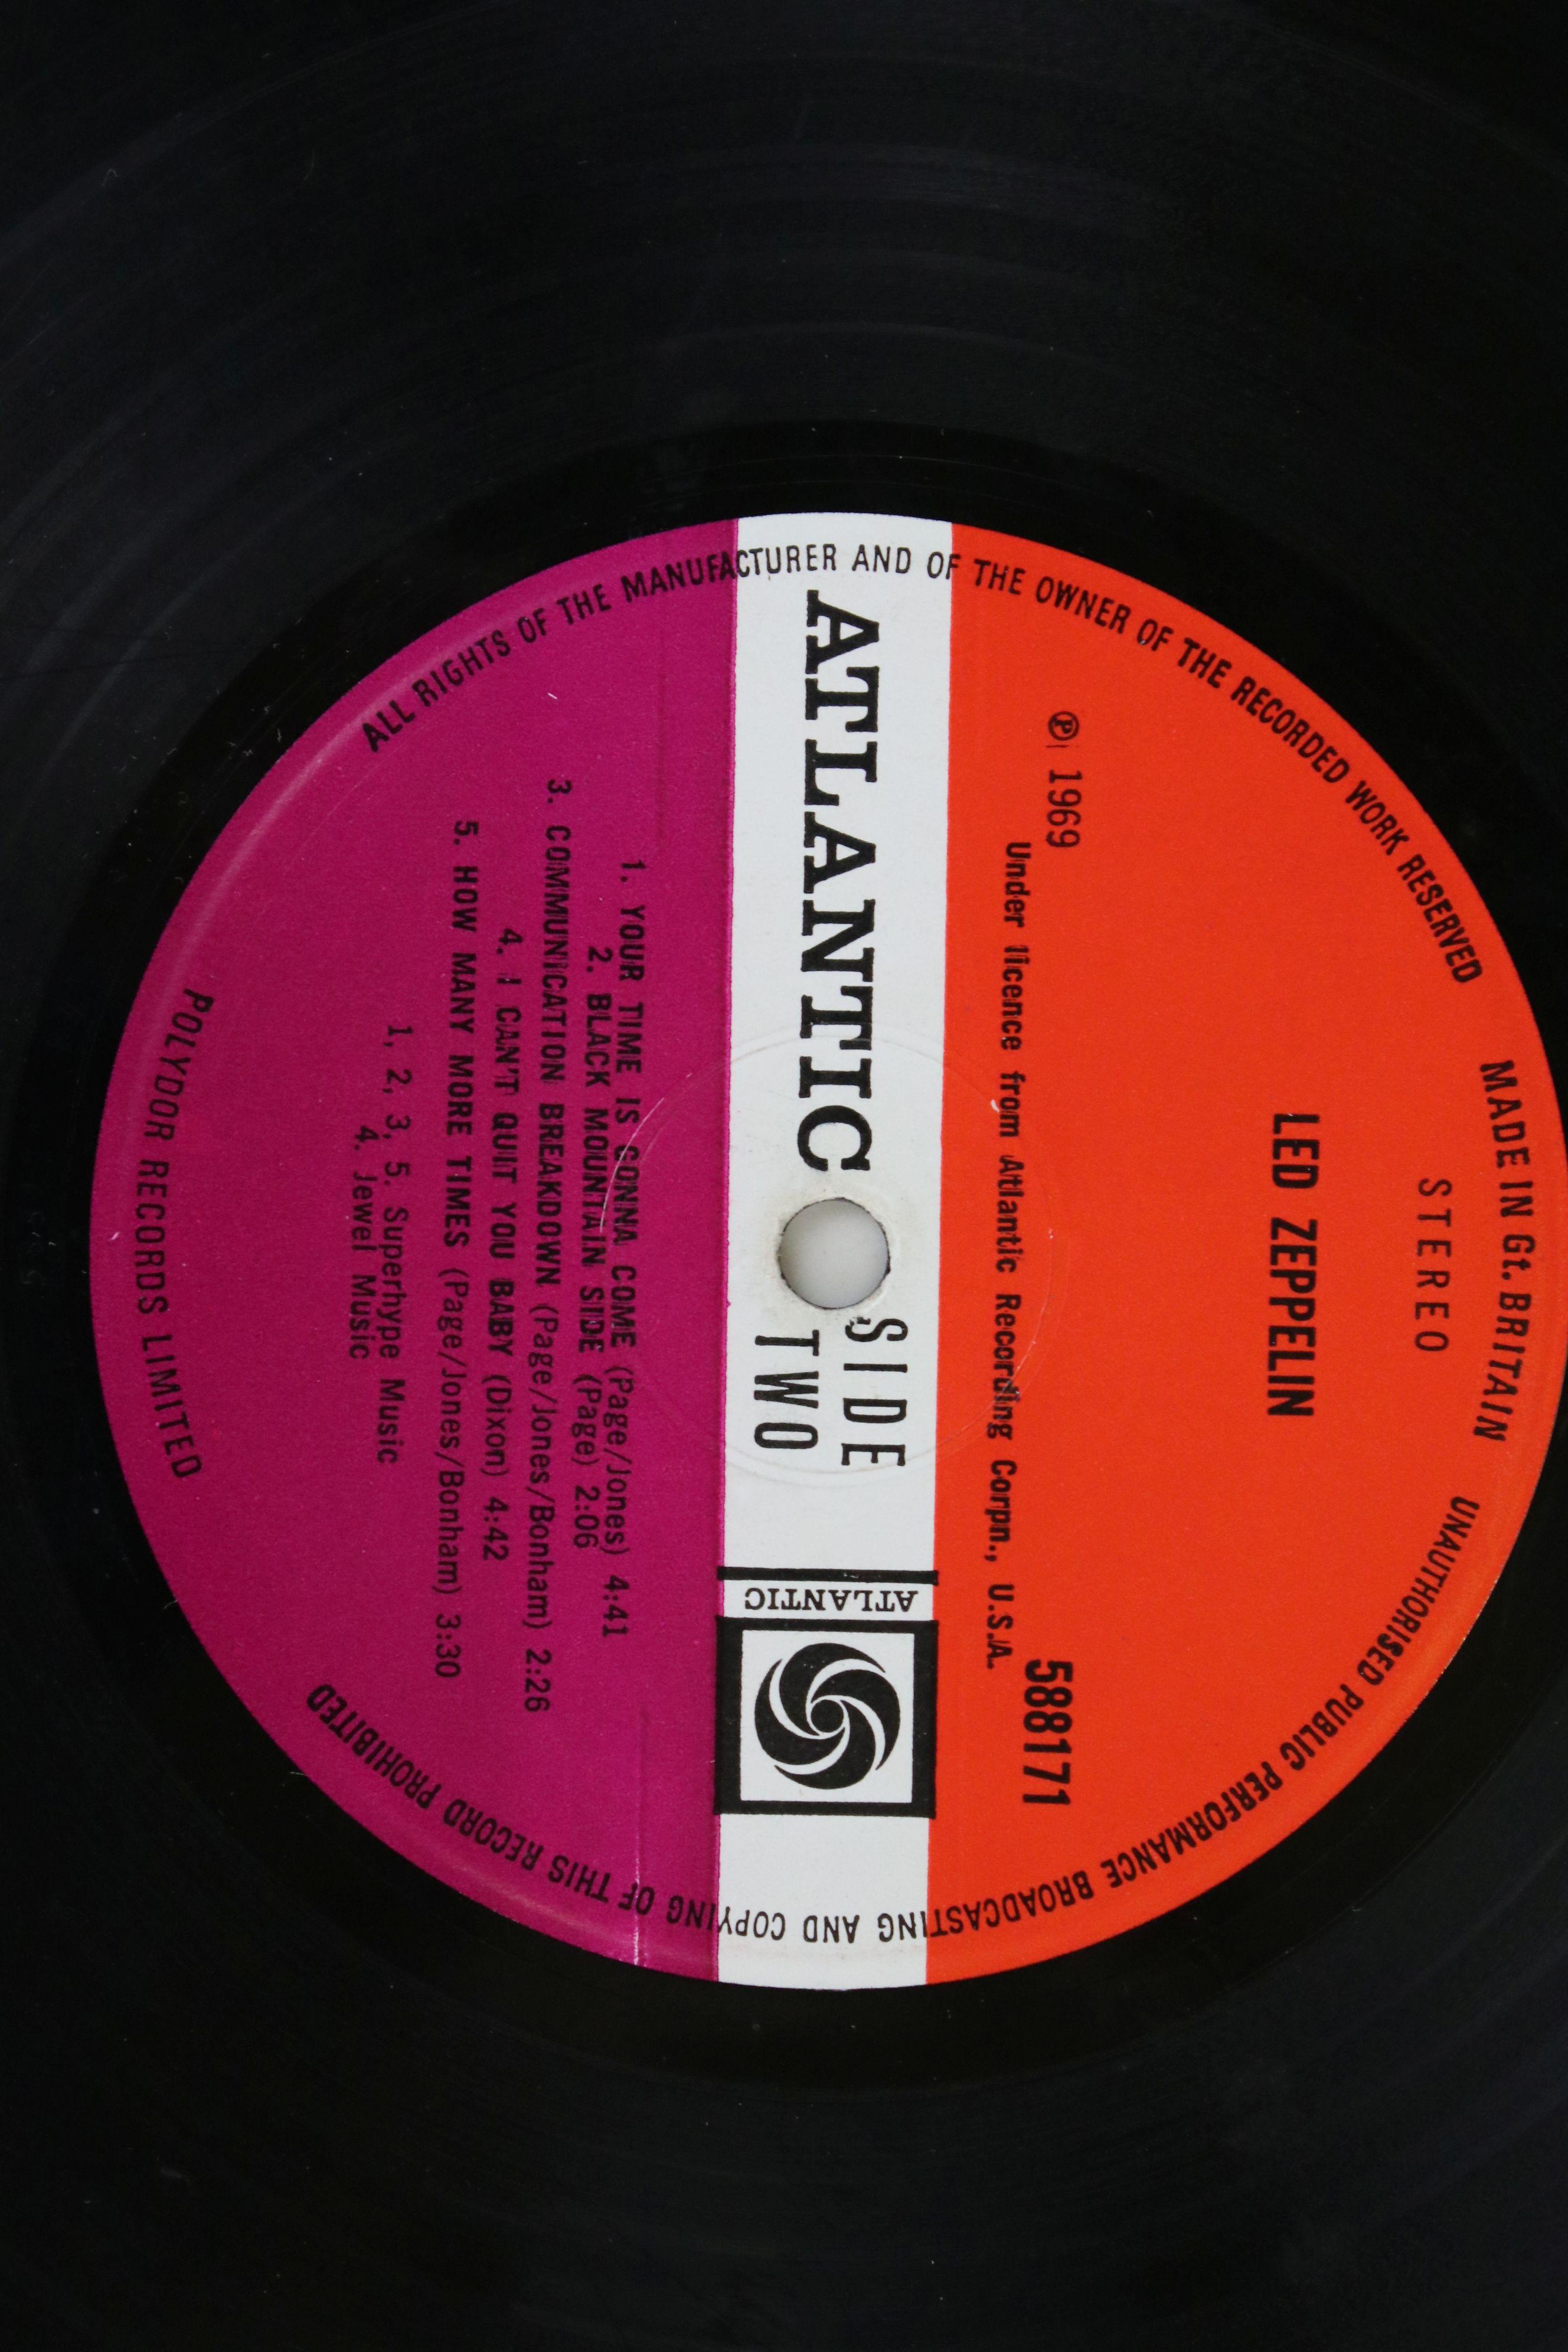 Vinyl - Led Zeppelin One (588171) Atlantic red/maroon label, Superhype publishing credit, - Image 4 of 5